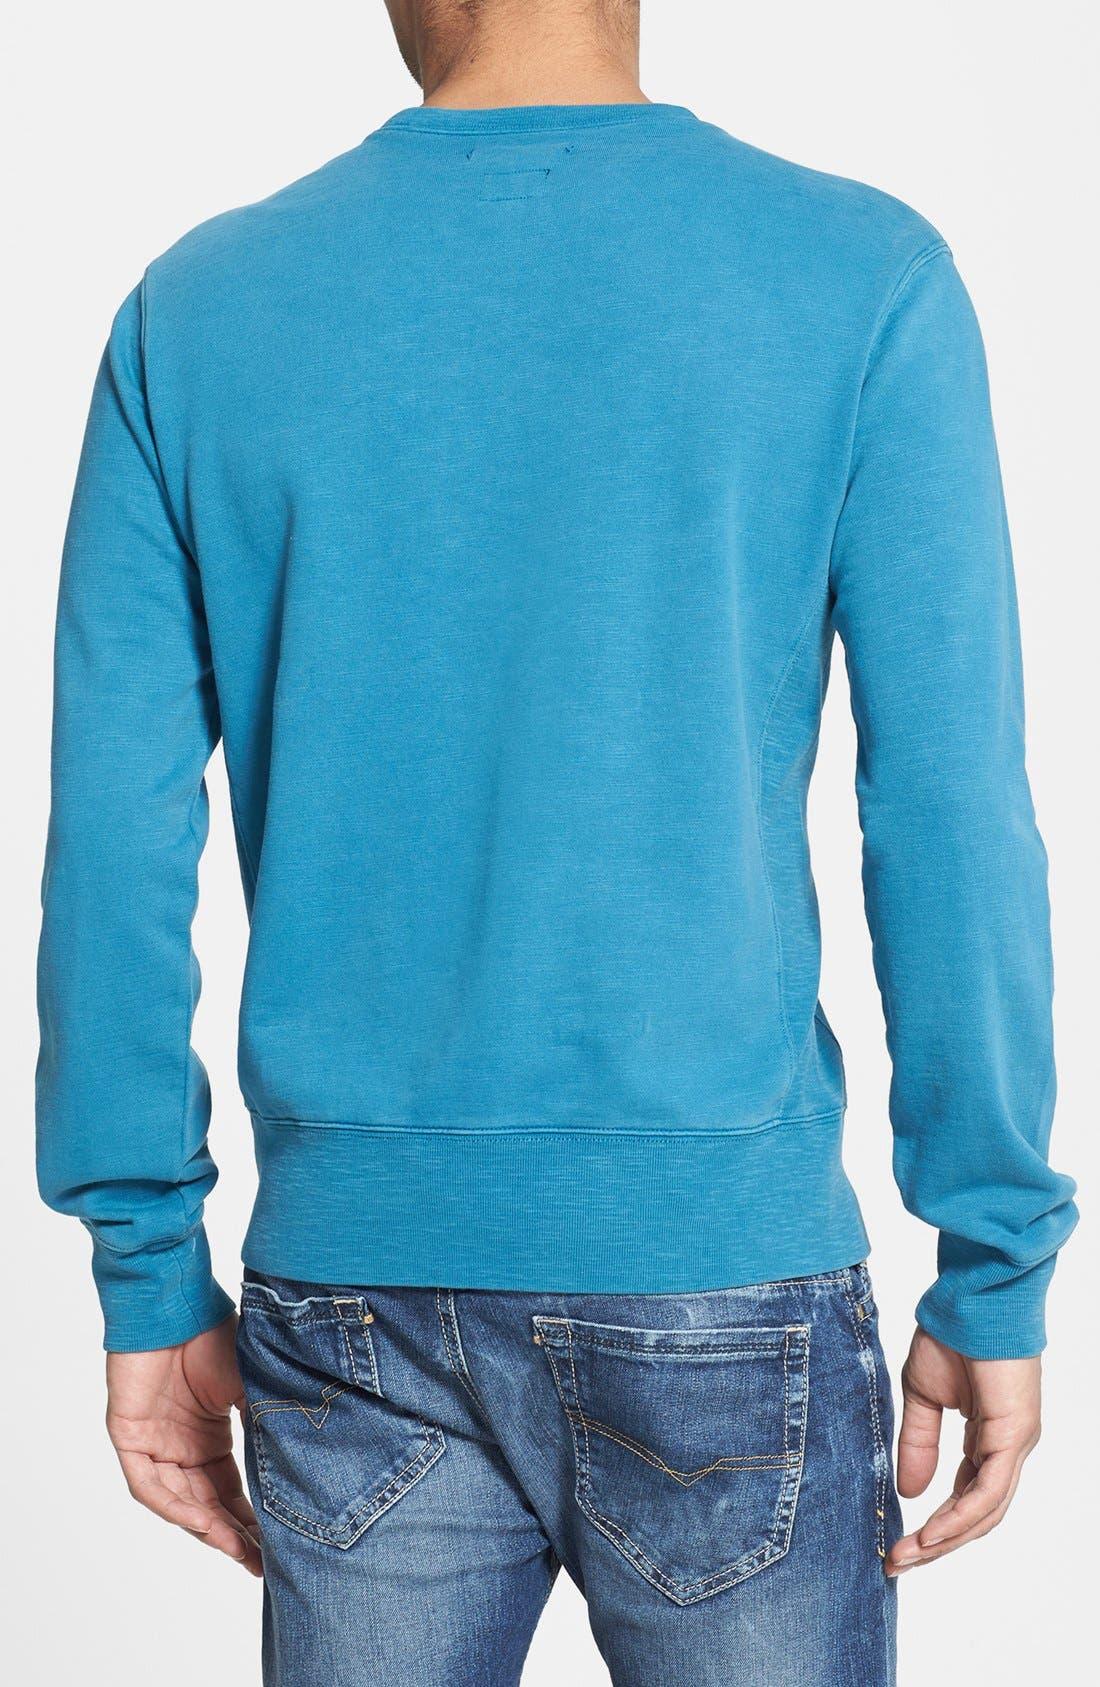 Alternate Image 2  - RVCA 'Desert Sun' Crewneck Sweatshirt